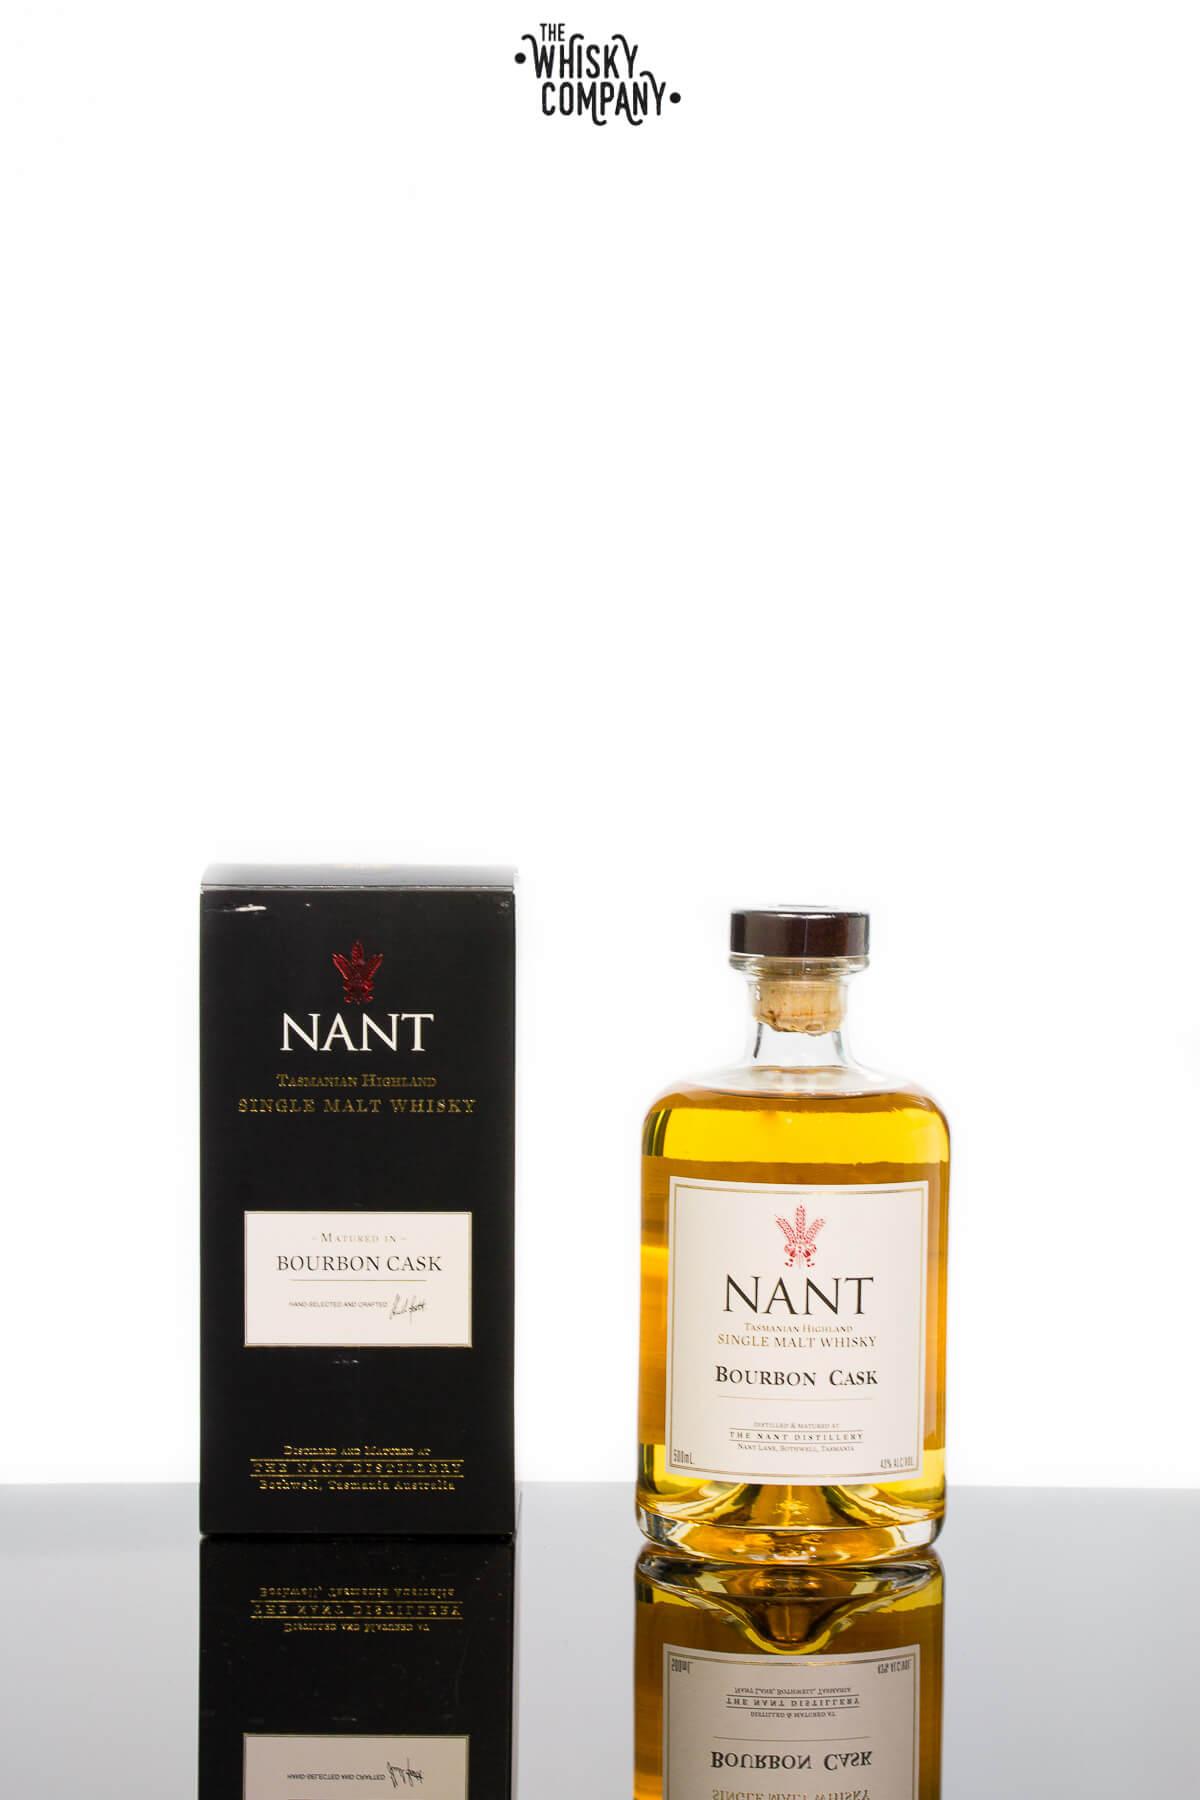 Nant Bourbon Cask Matured Tasmanian Highland Single Malt Whisky (500ml)